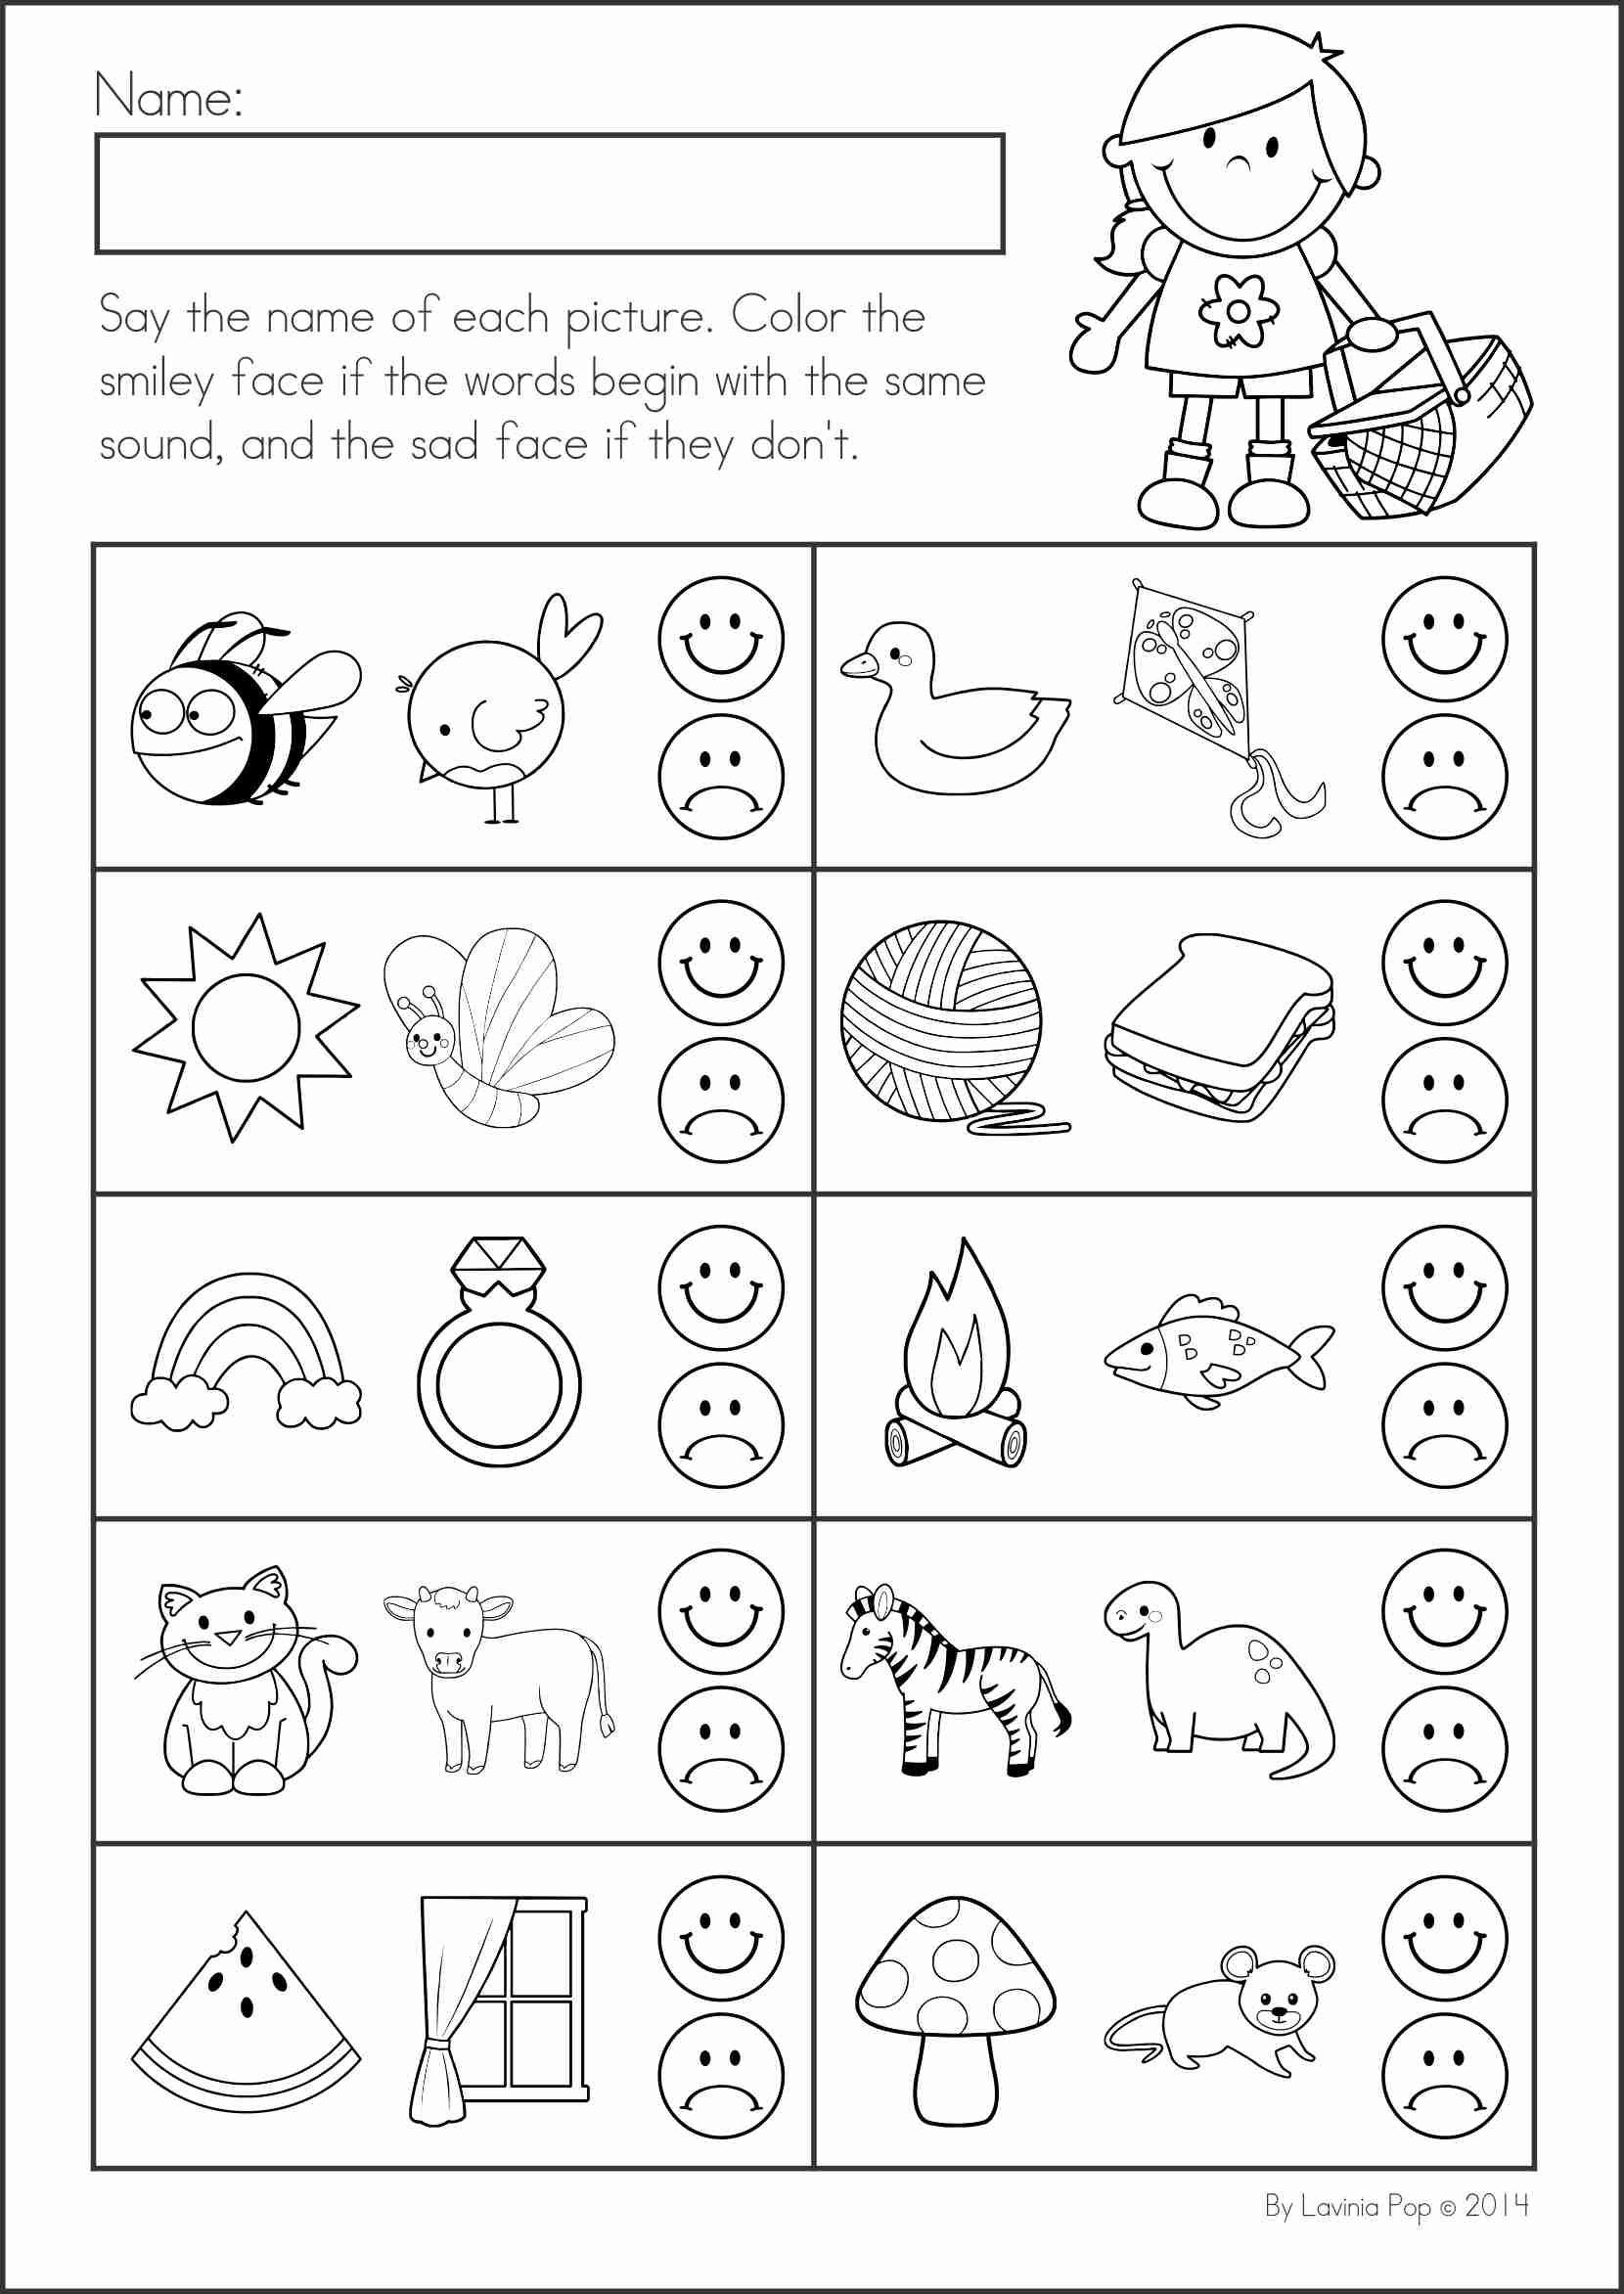 Summer Review Kindergarten Math Literacy Worksheets Activities Imagenes Educativas Educacion Cursillo [ 2345 x 1660 Pixel ]